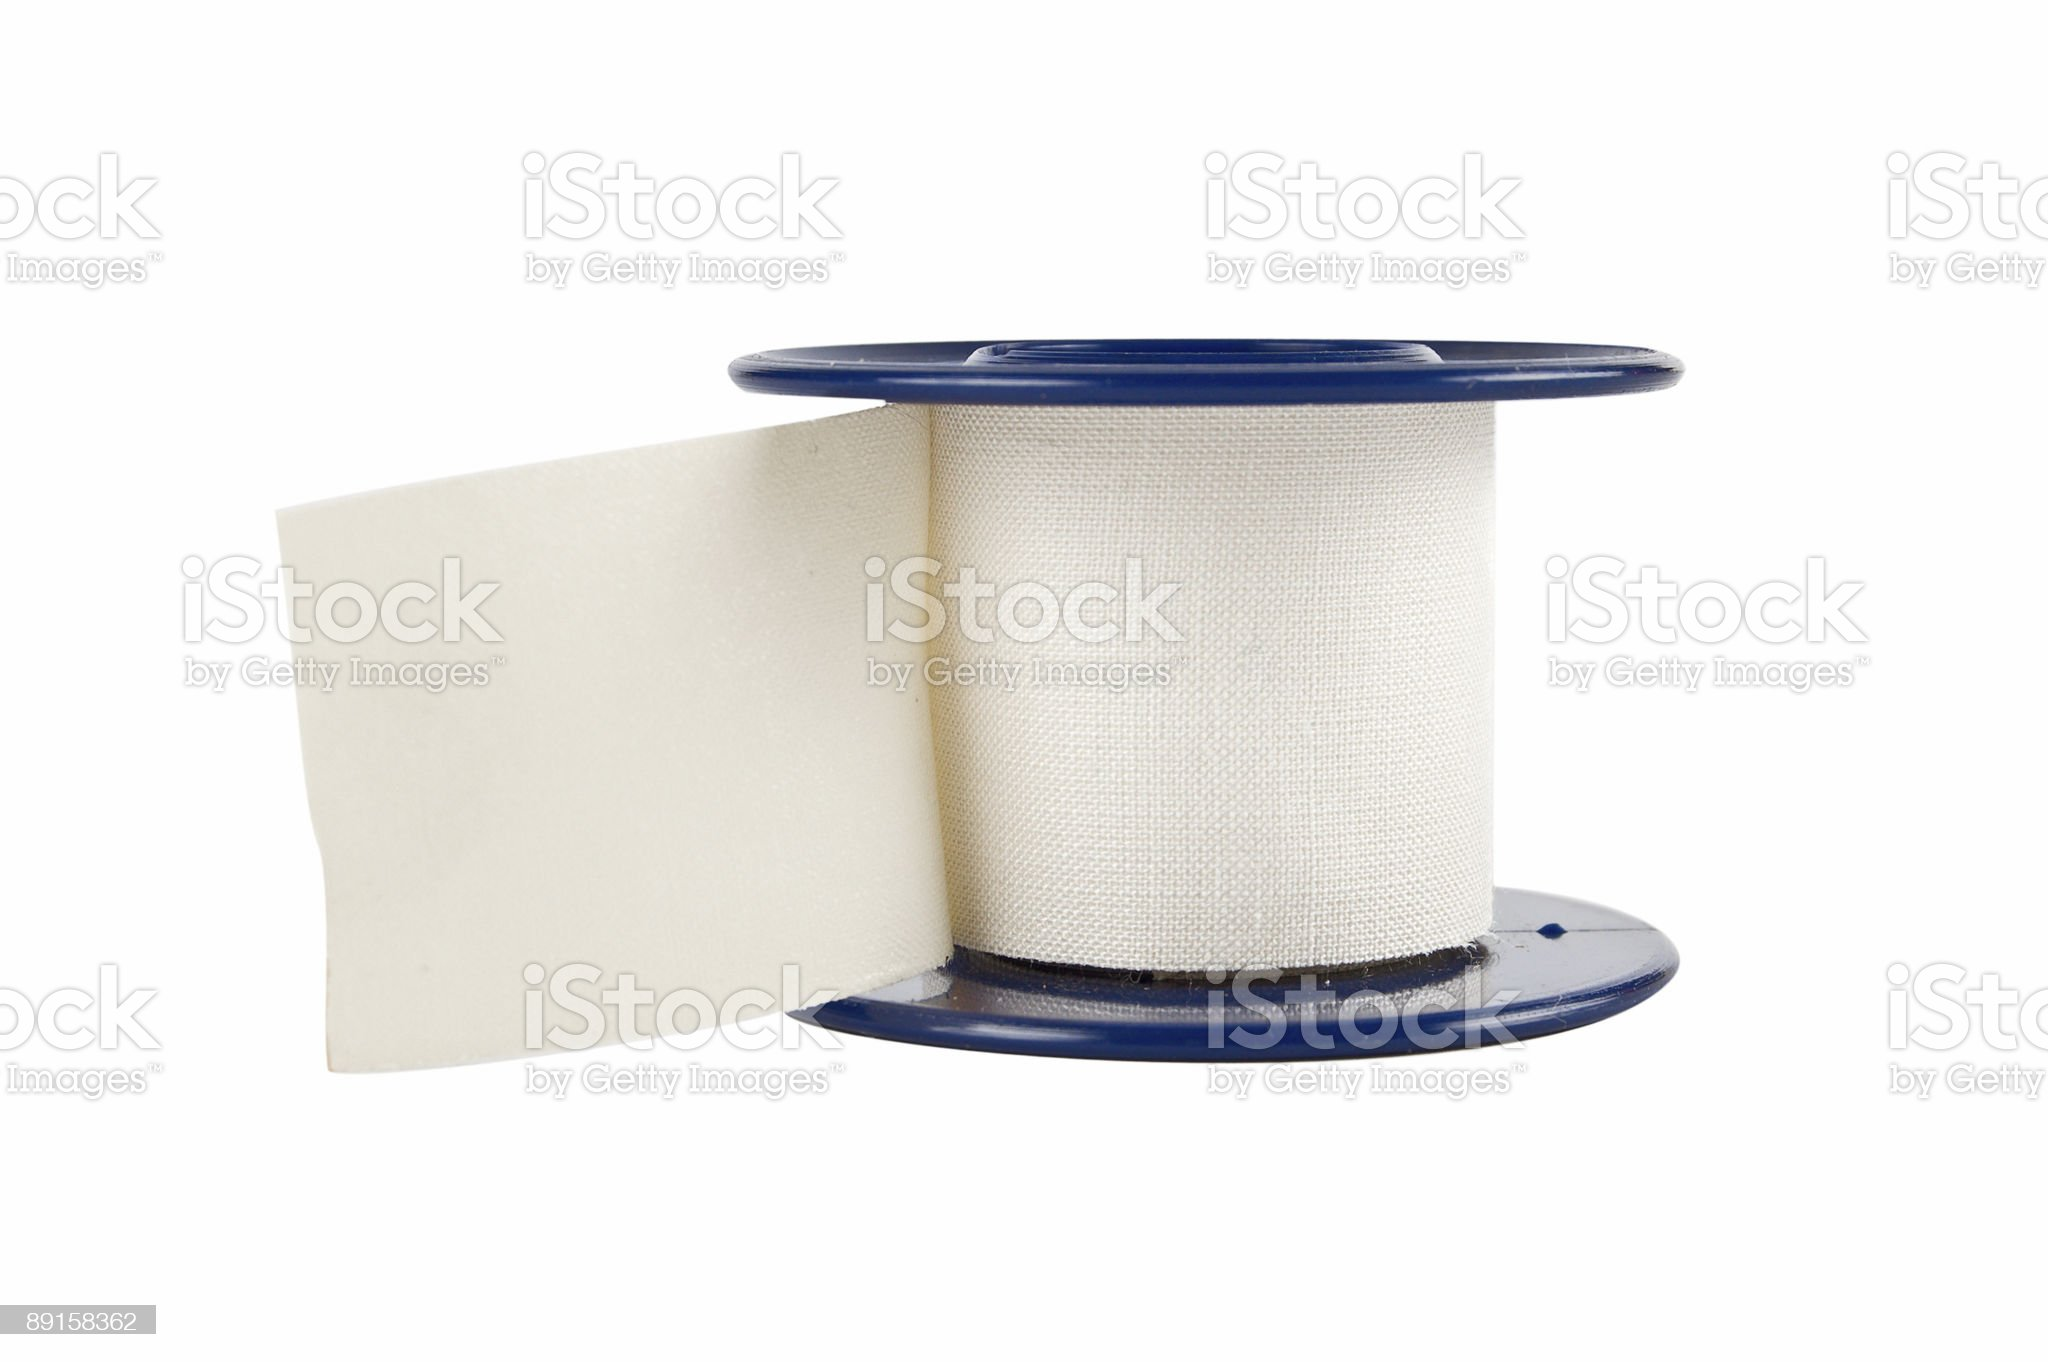 Medical sticking plaster royalty-free stock photo